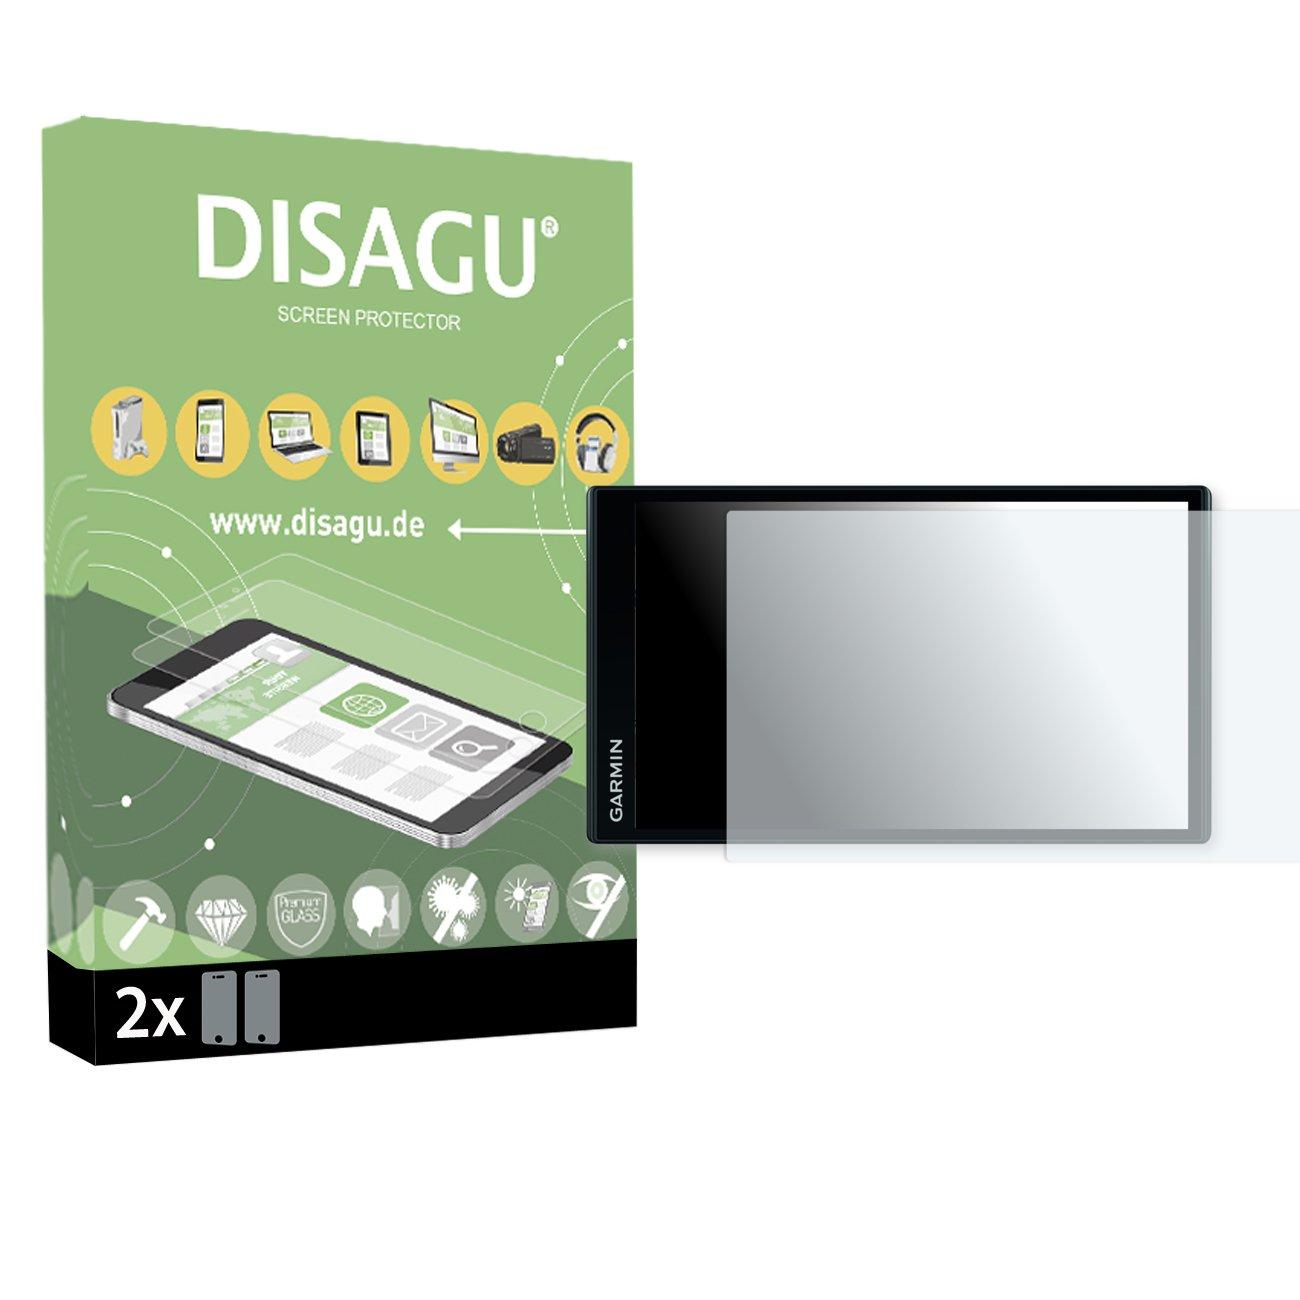 2x DISAGU flexible tempered glass for Garmin DriveSmart 61 LMT armor glass 9H hard glass screen protective film 3D compatible